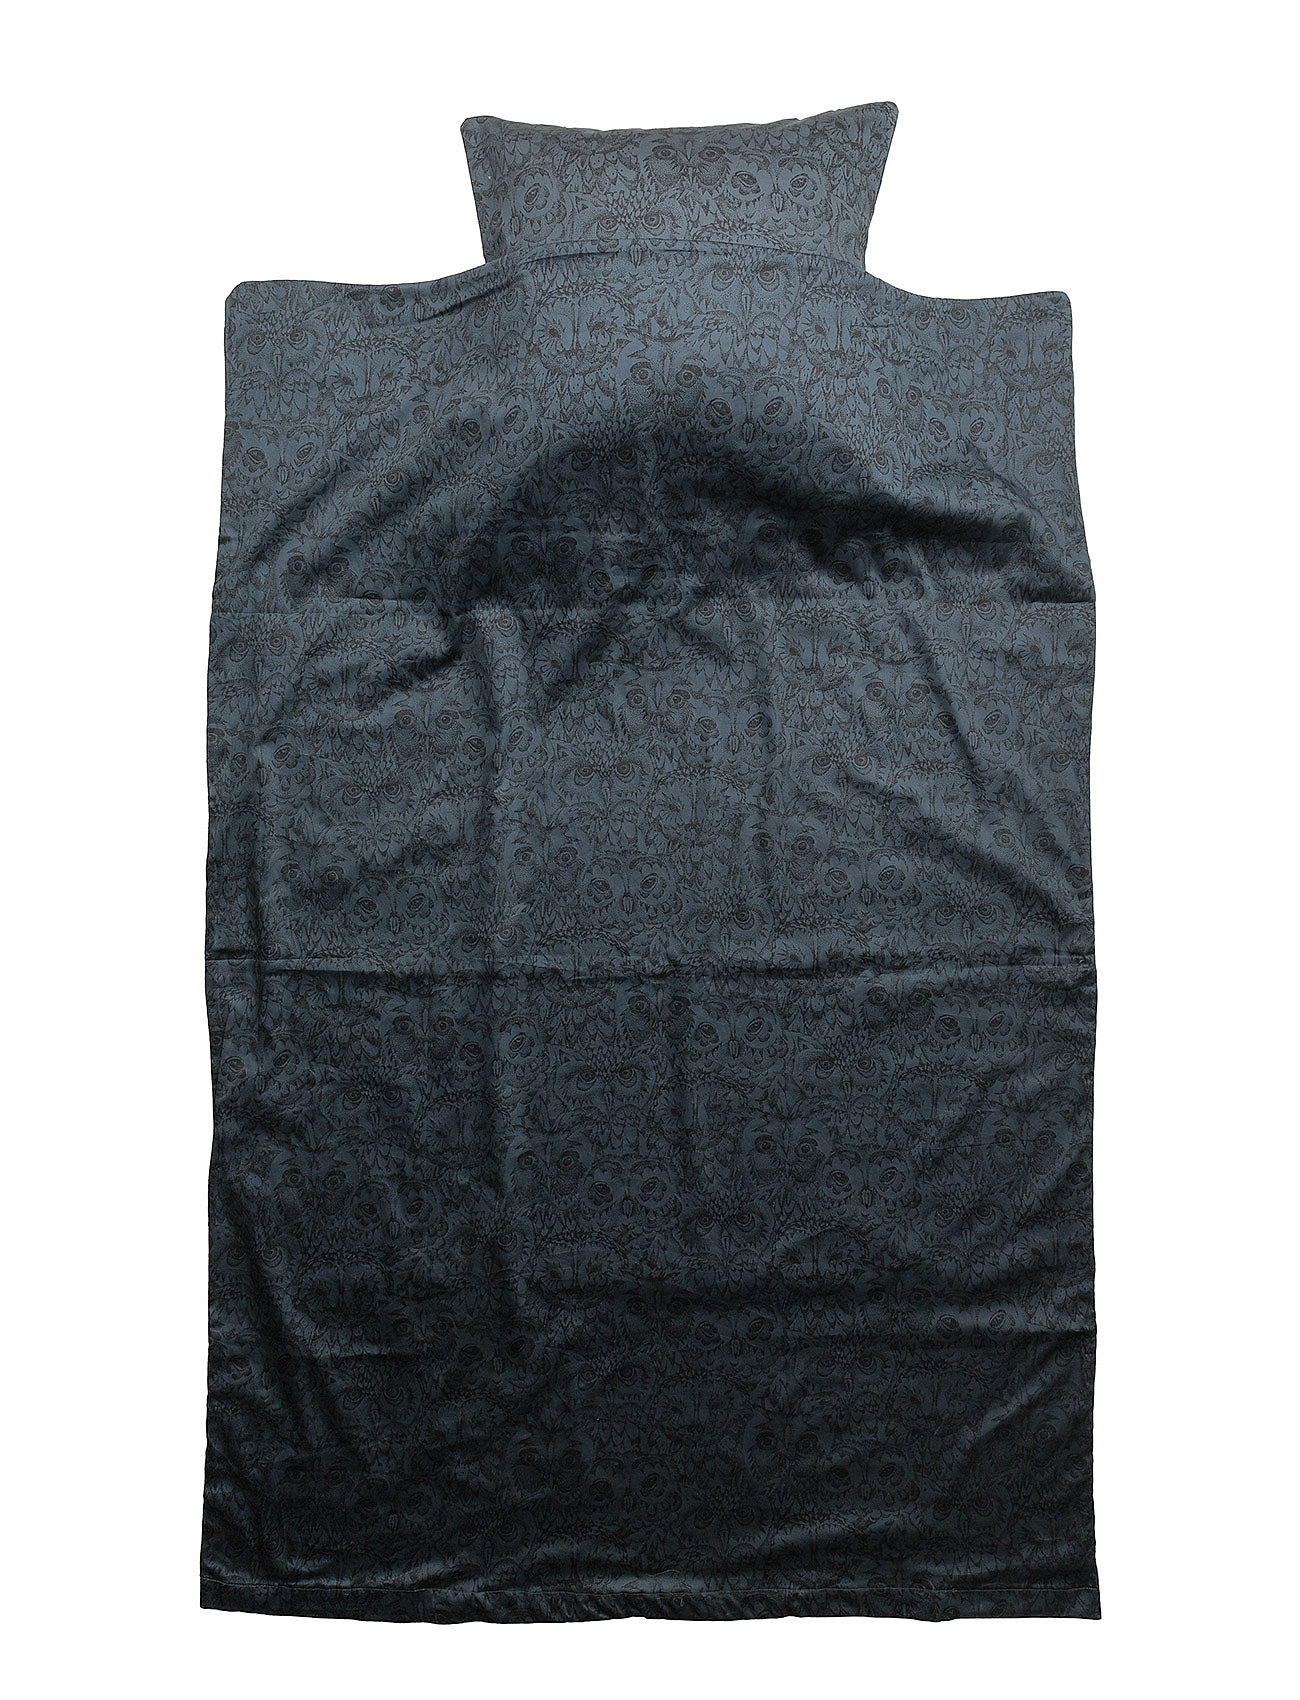 Soft Gallery Bed Linen Junior